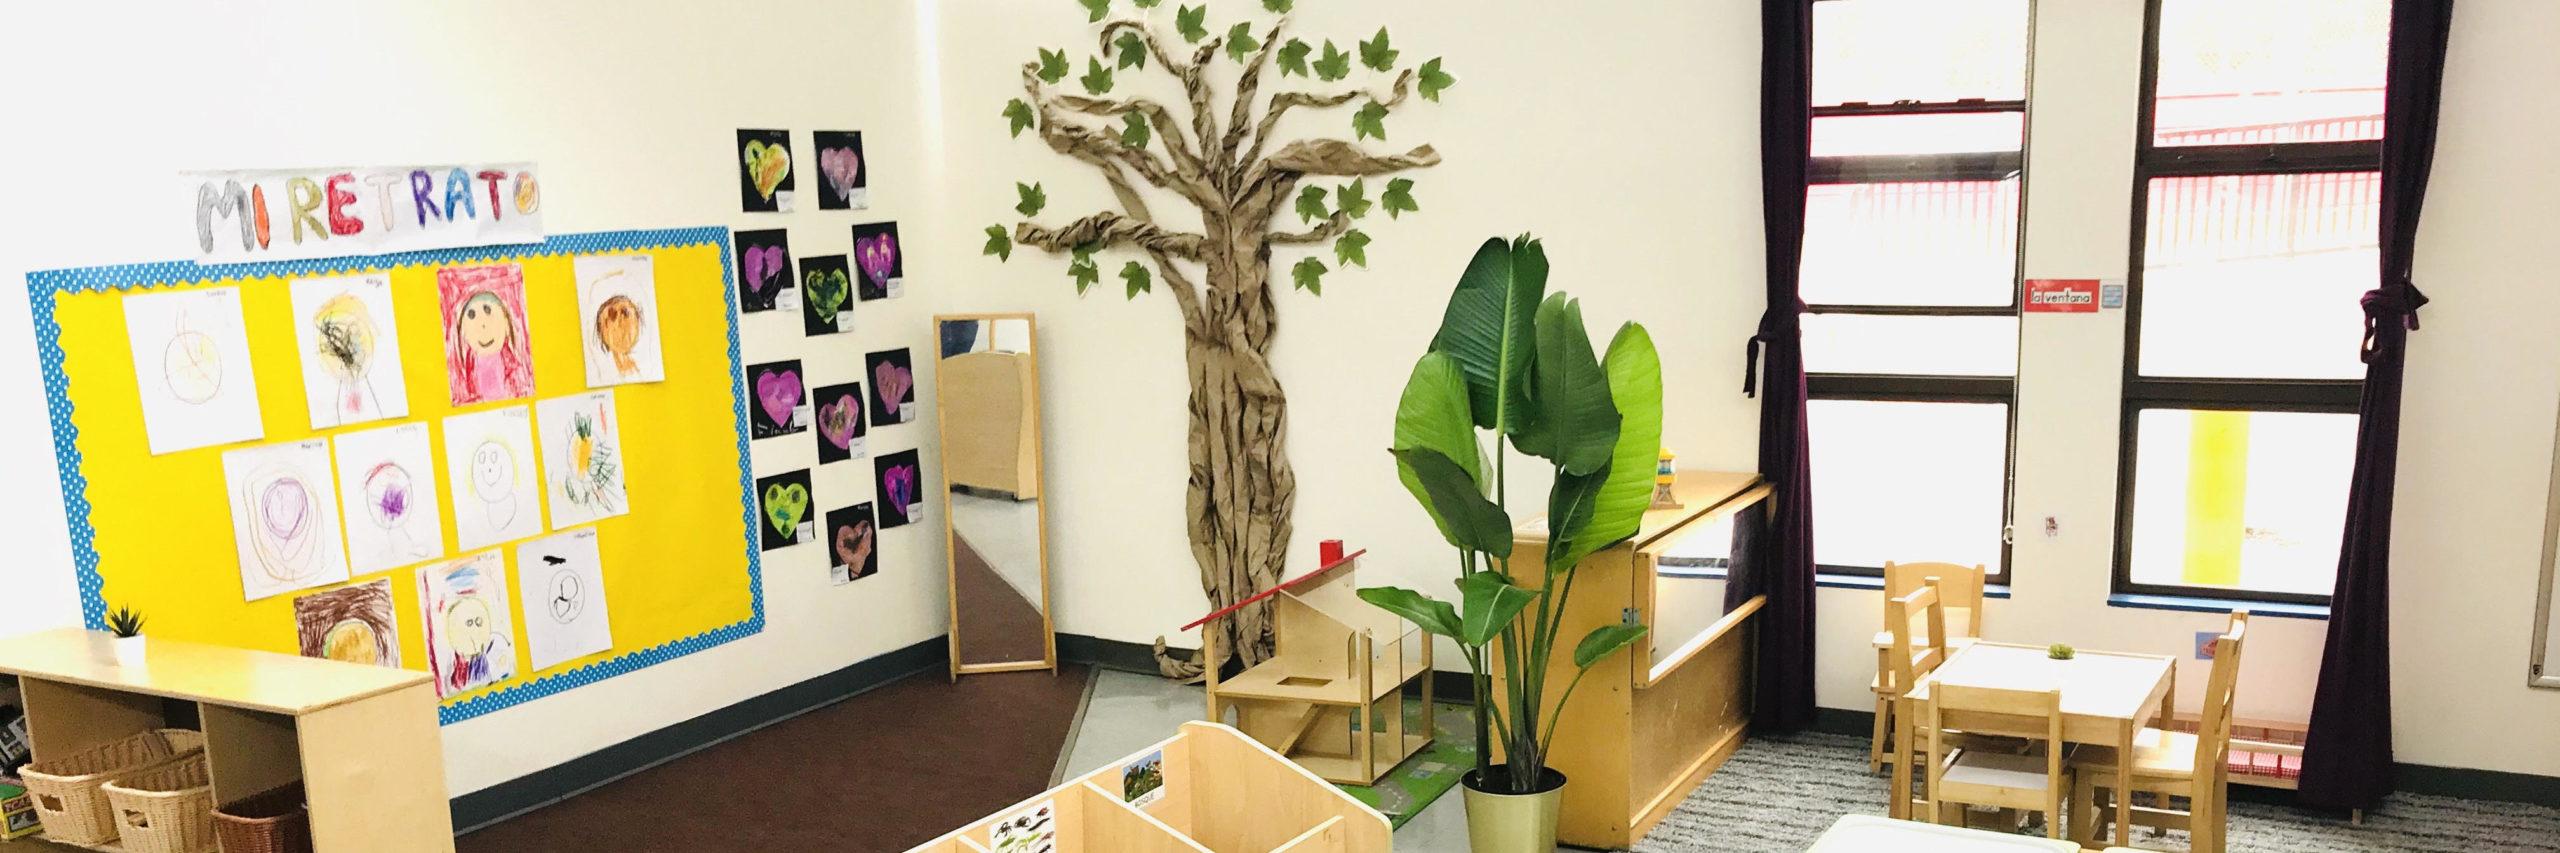 KSS Preschool Albany Classroom